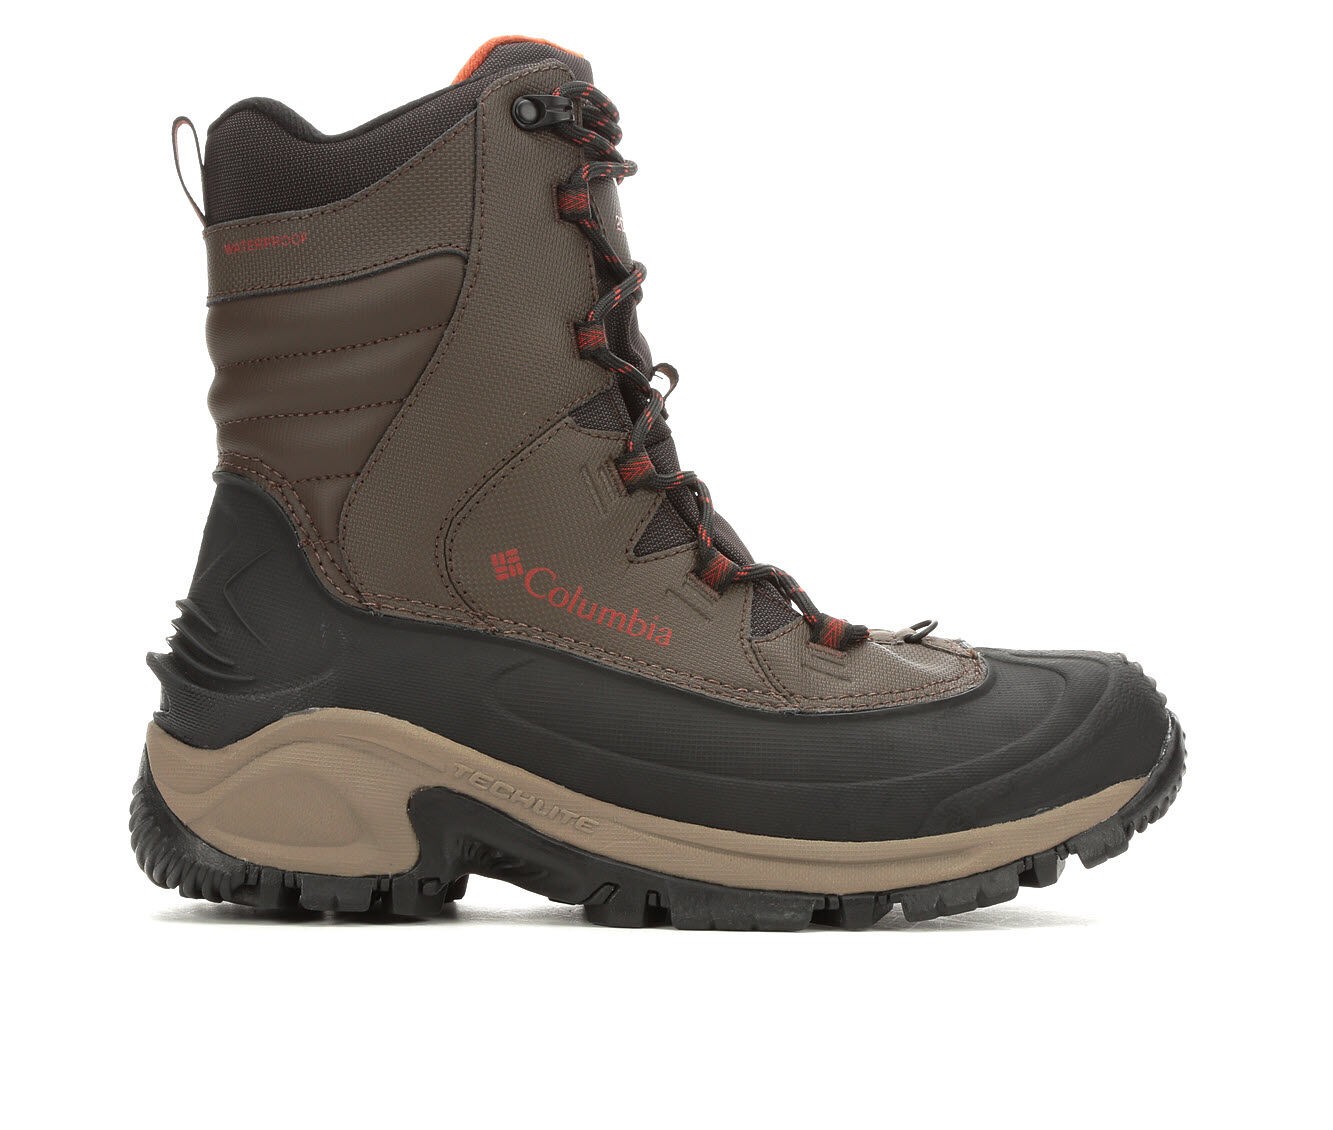 choose authentic Men's Columbia Bugaboot III Winter Boots Cordo/Rust